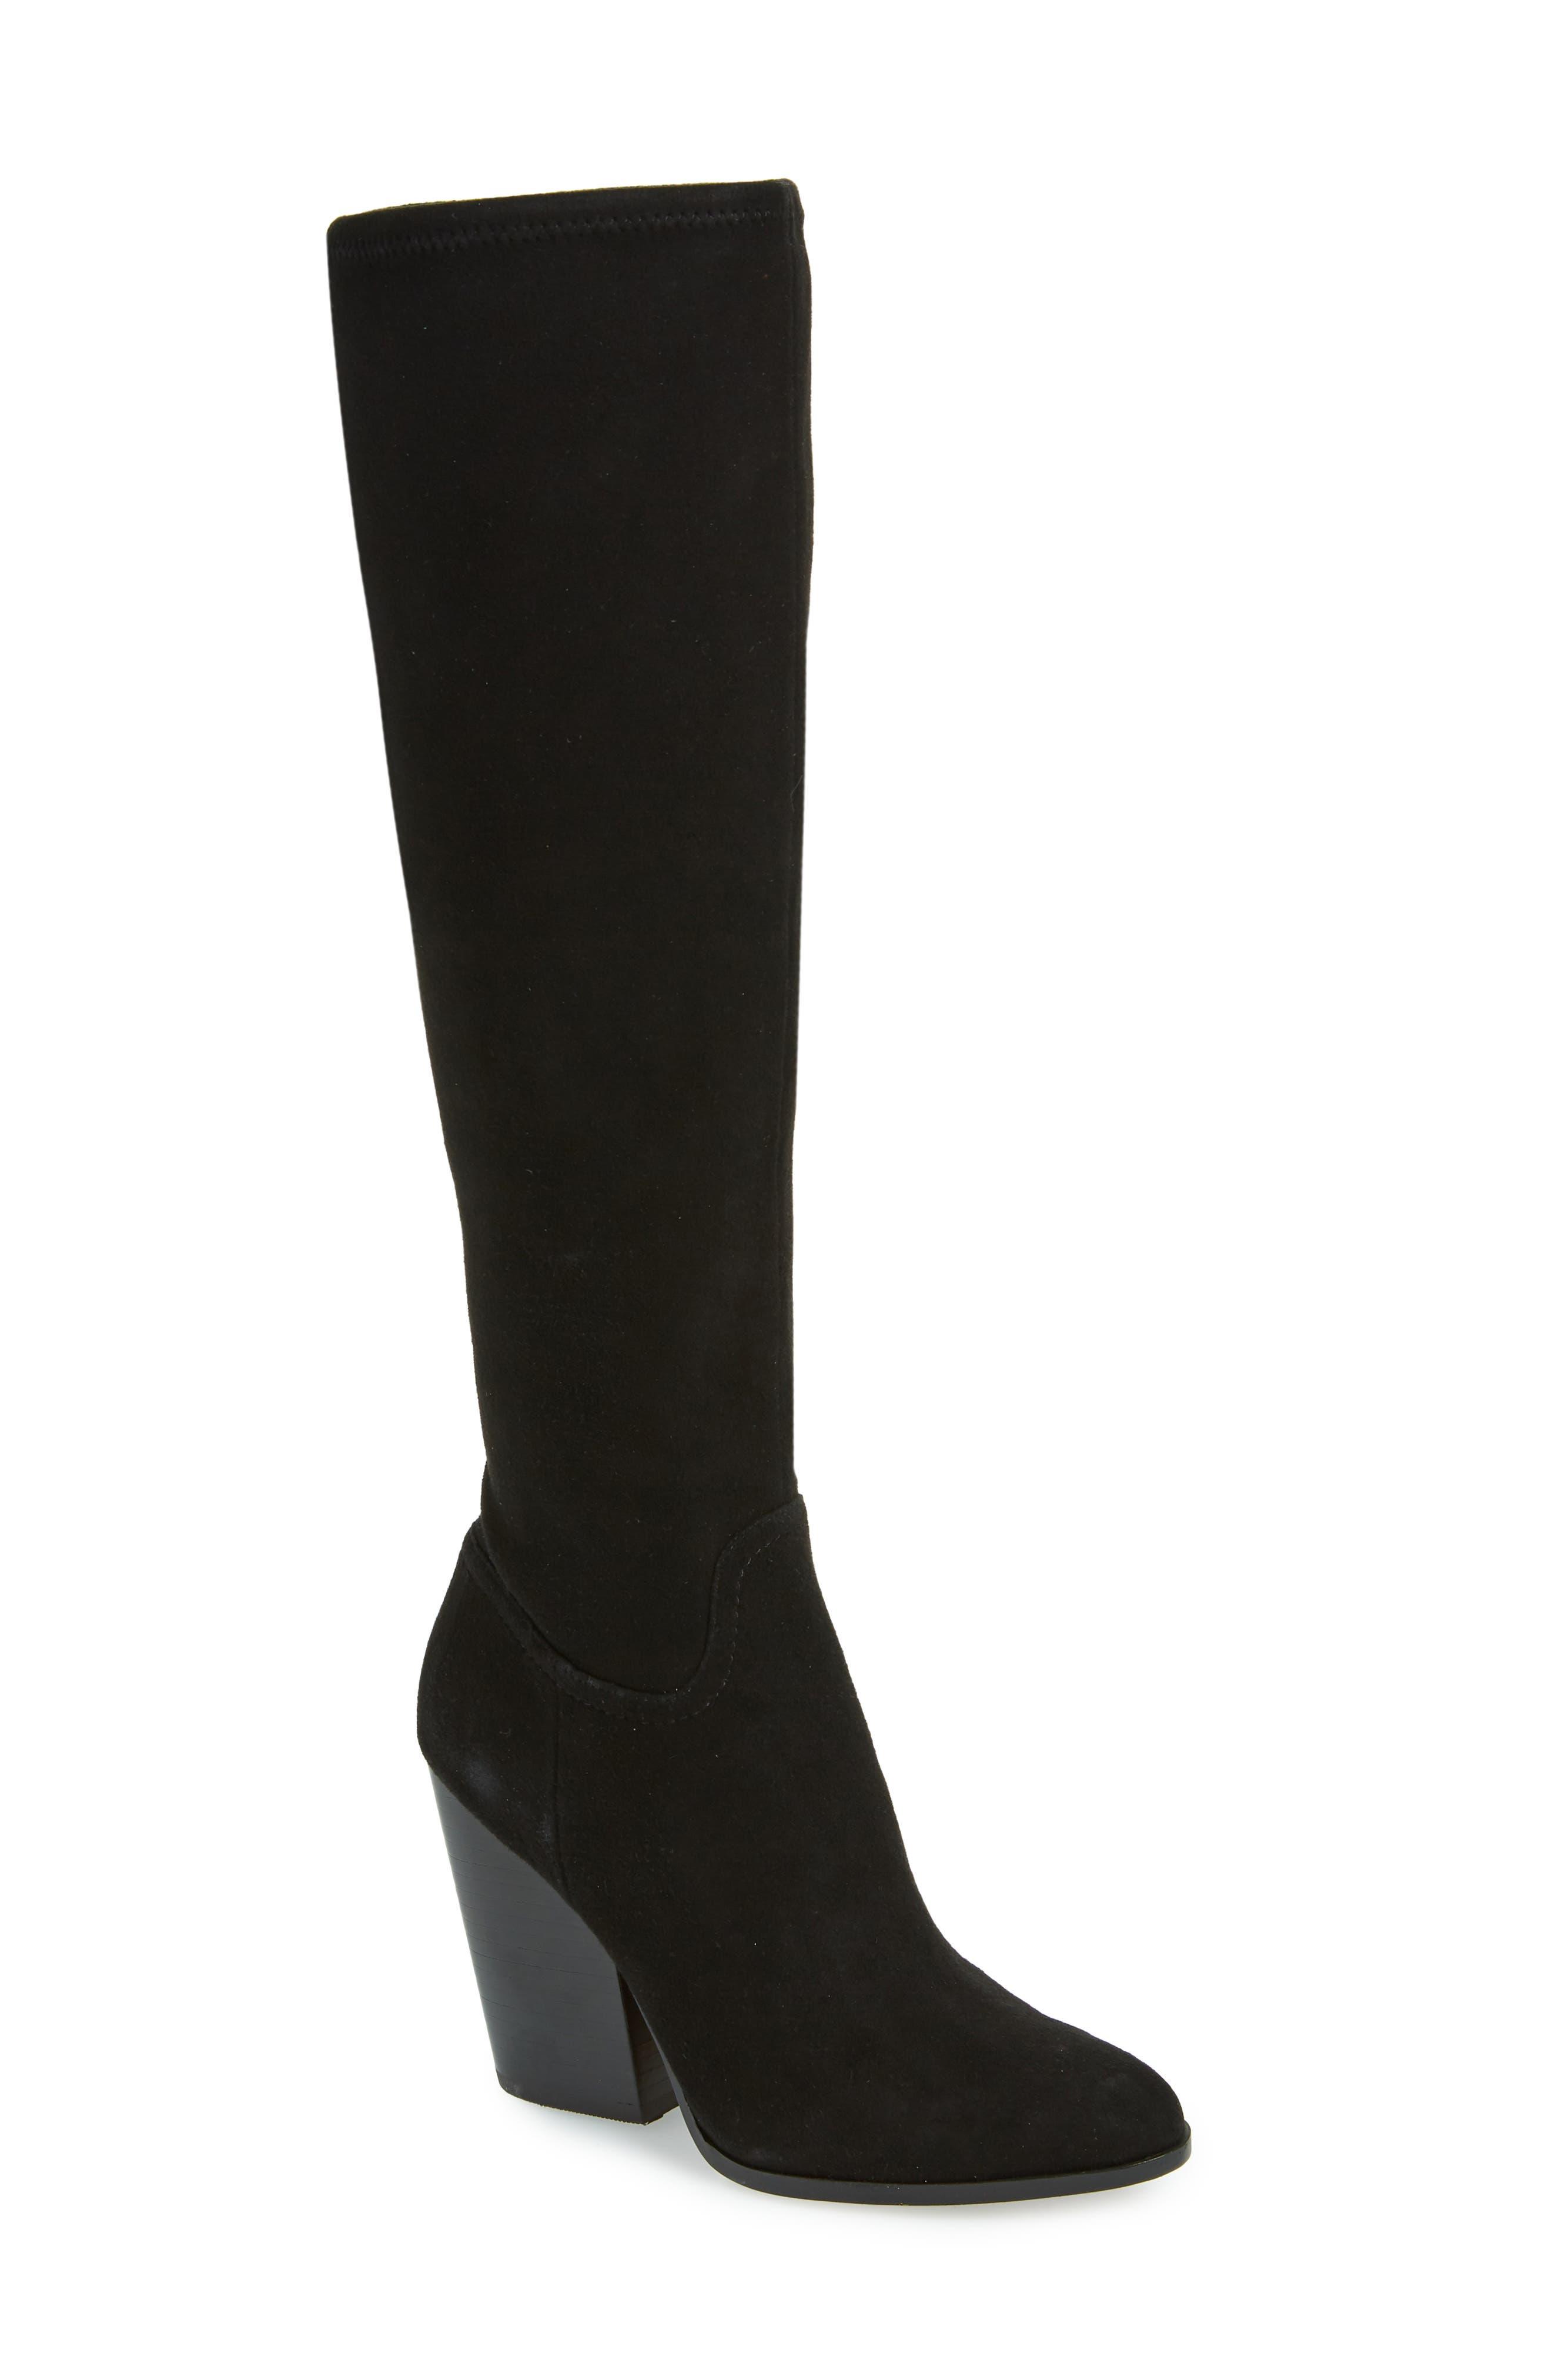 Linea Paolo Elena Knee High Boot- Black